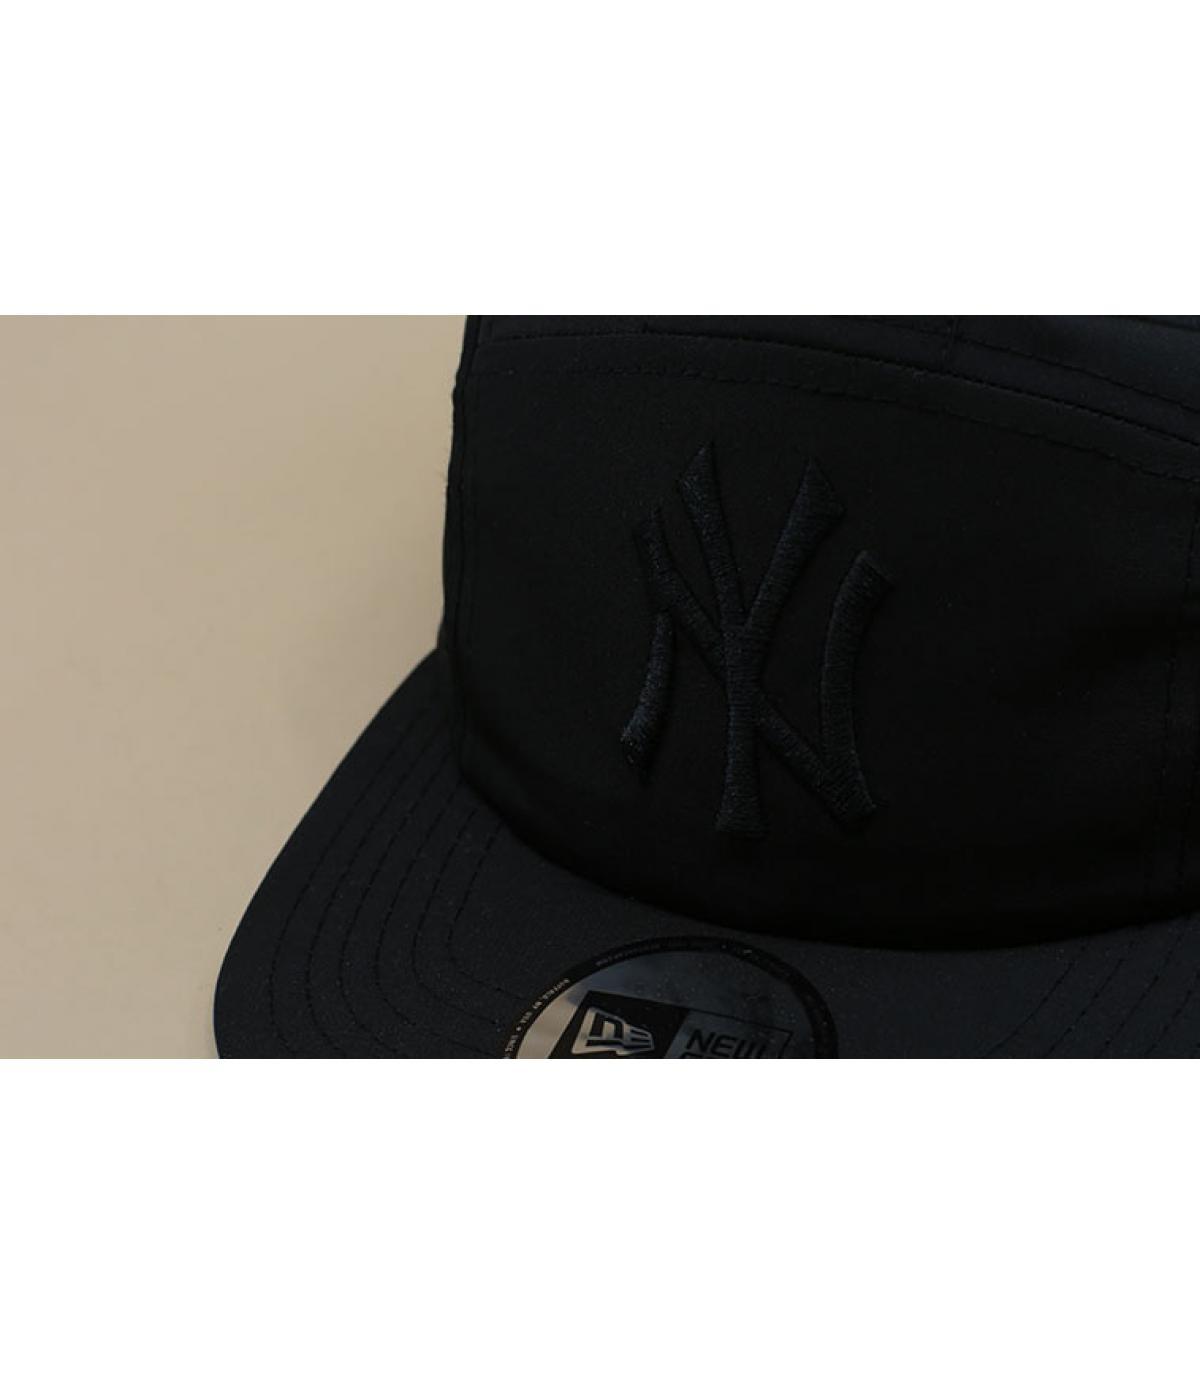 Details MLB Camper NY black - Abbildung 3